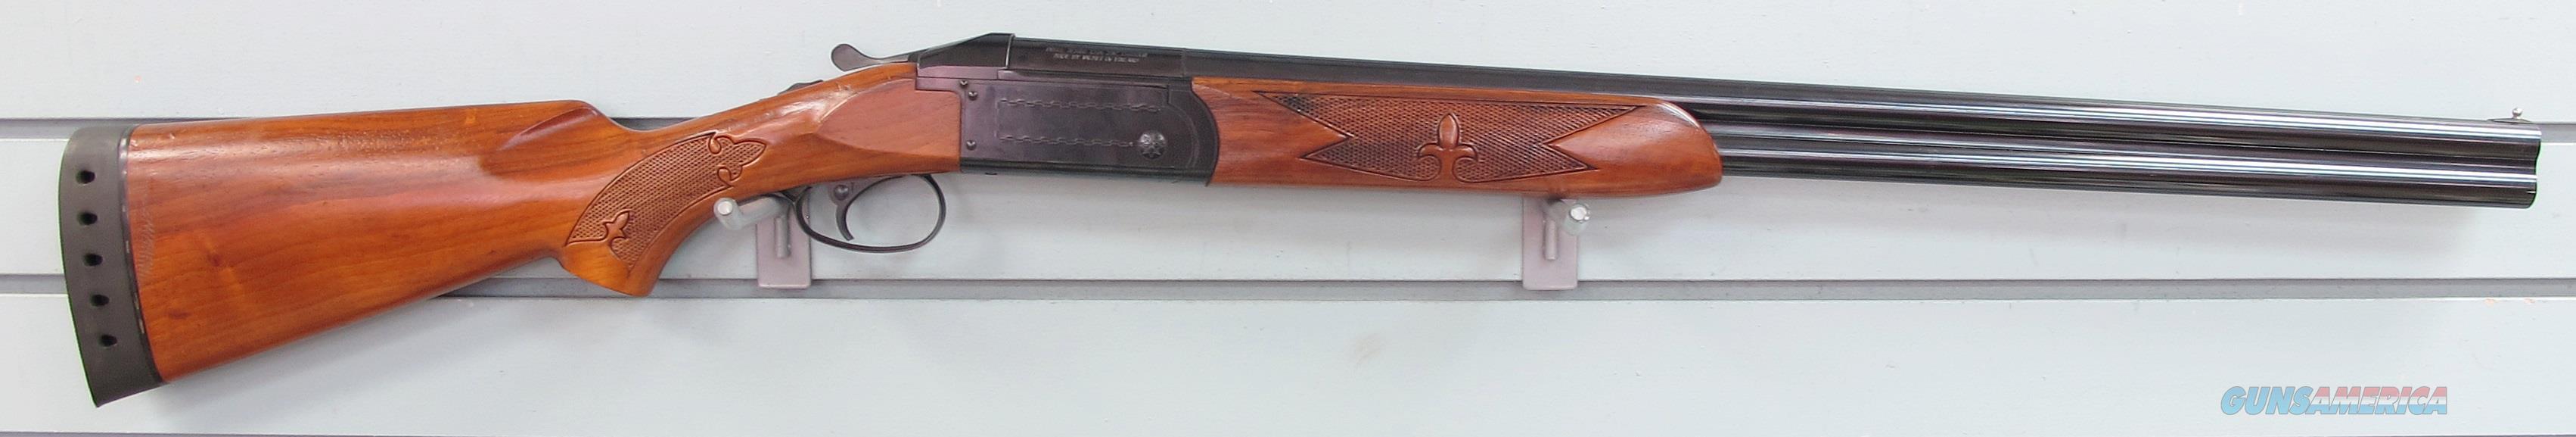 SAVAGE 12 GA MODEL 330   Guns > Shotguns > Savage Shotguns